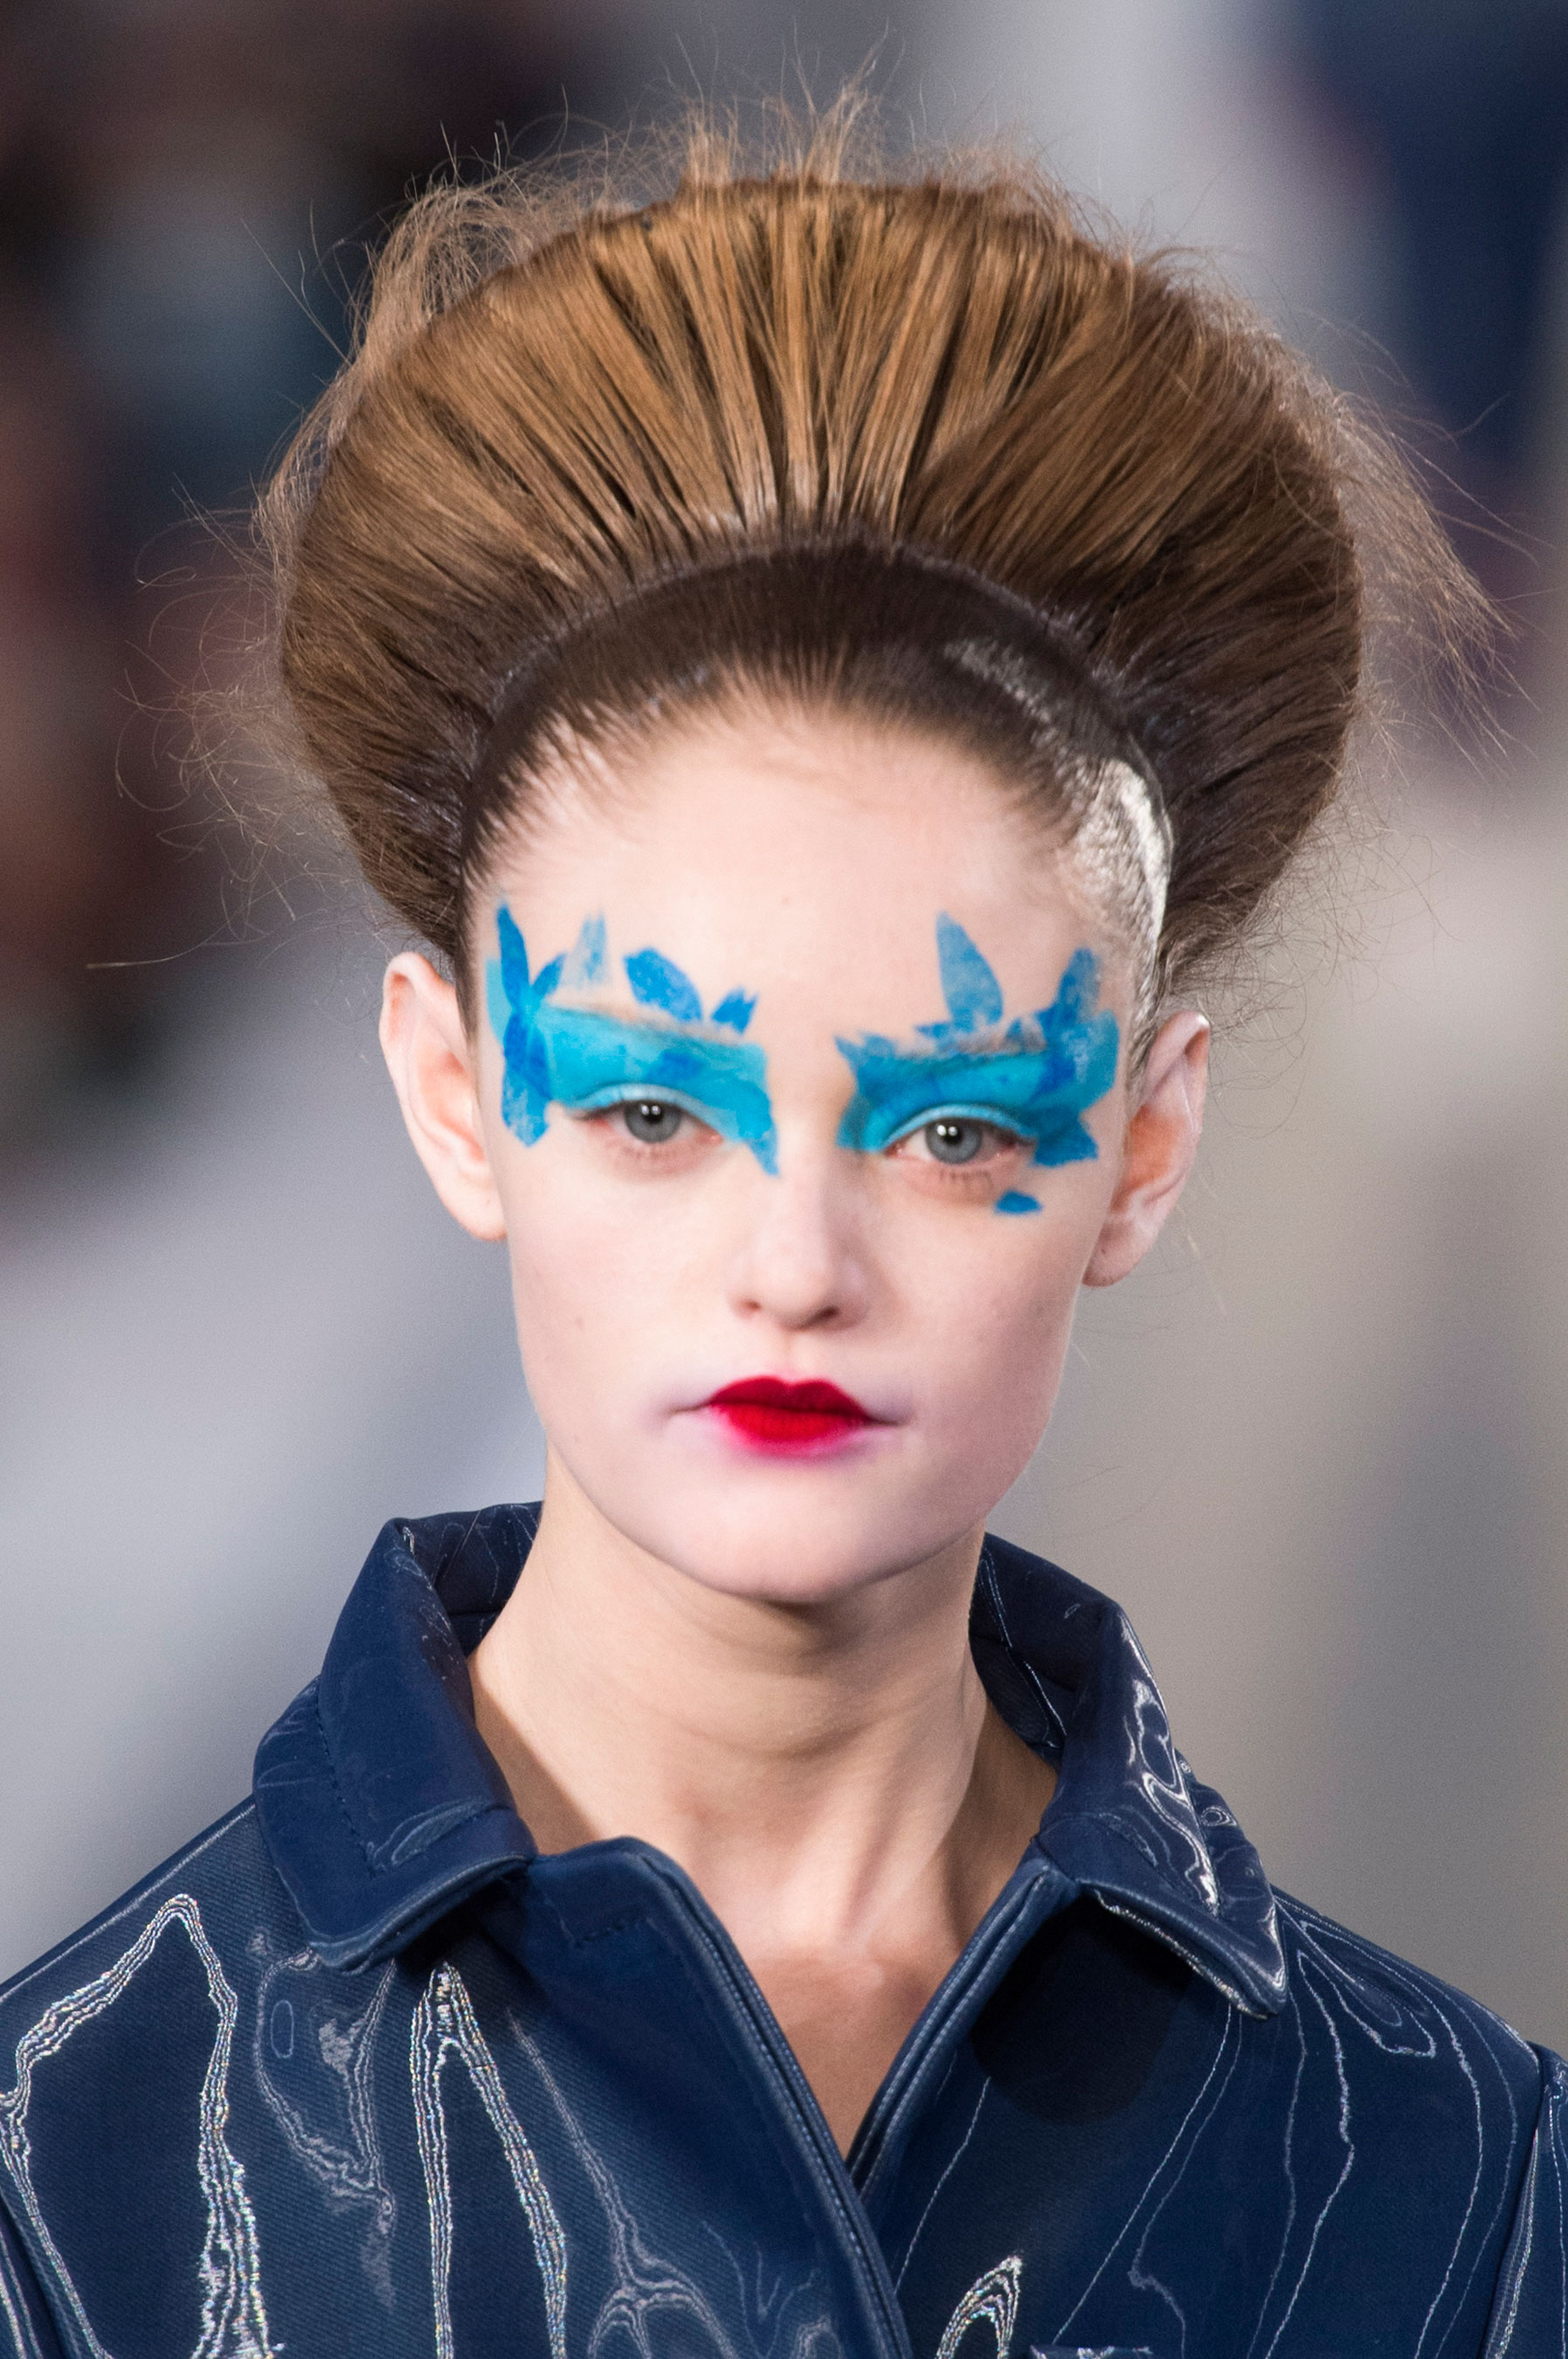 Maison-Margiela-spring-2016-runway-beauty-fashion-show-the-impression-047